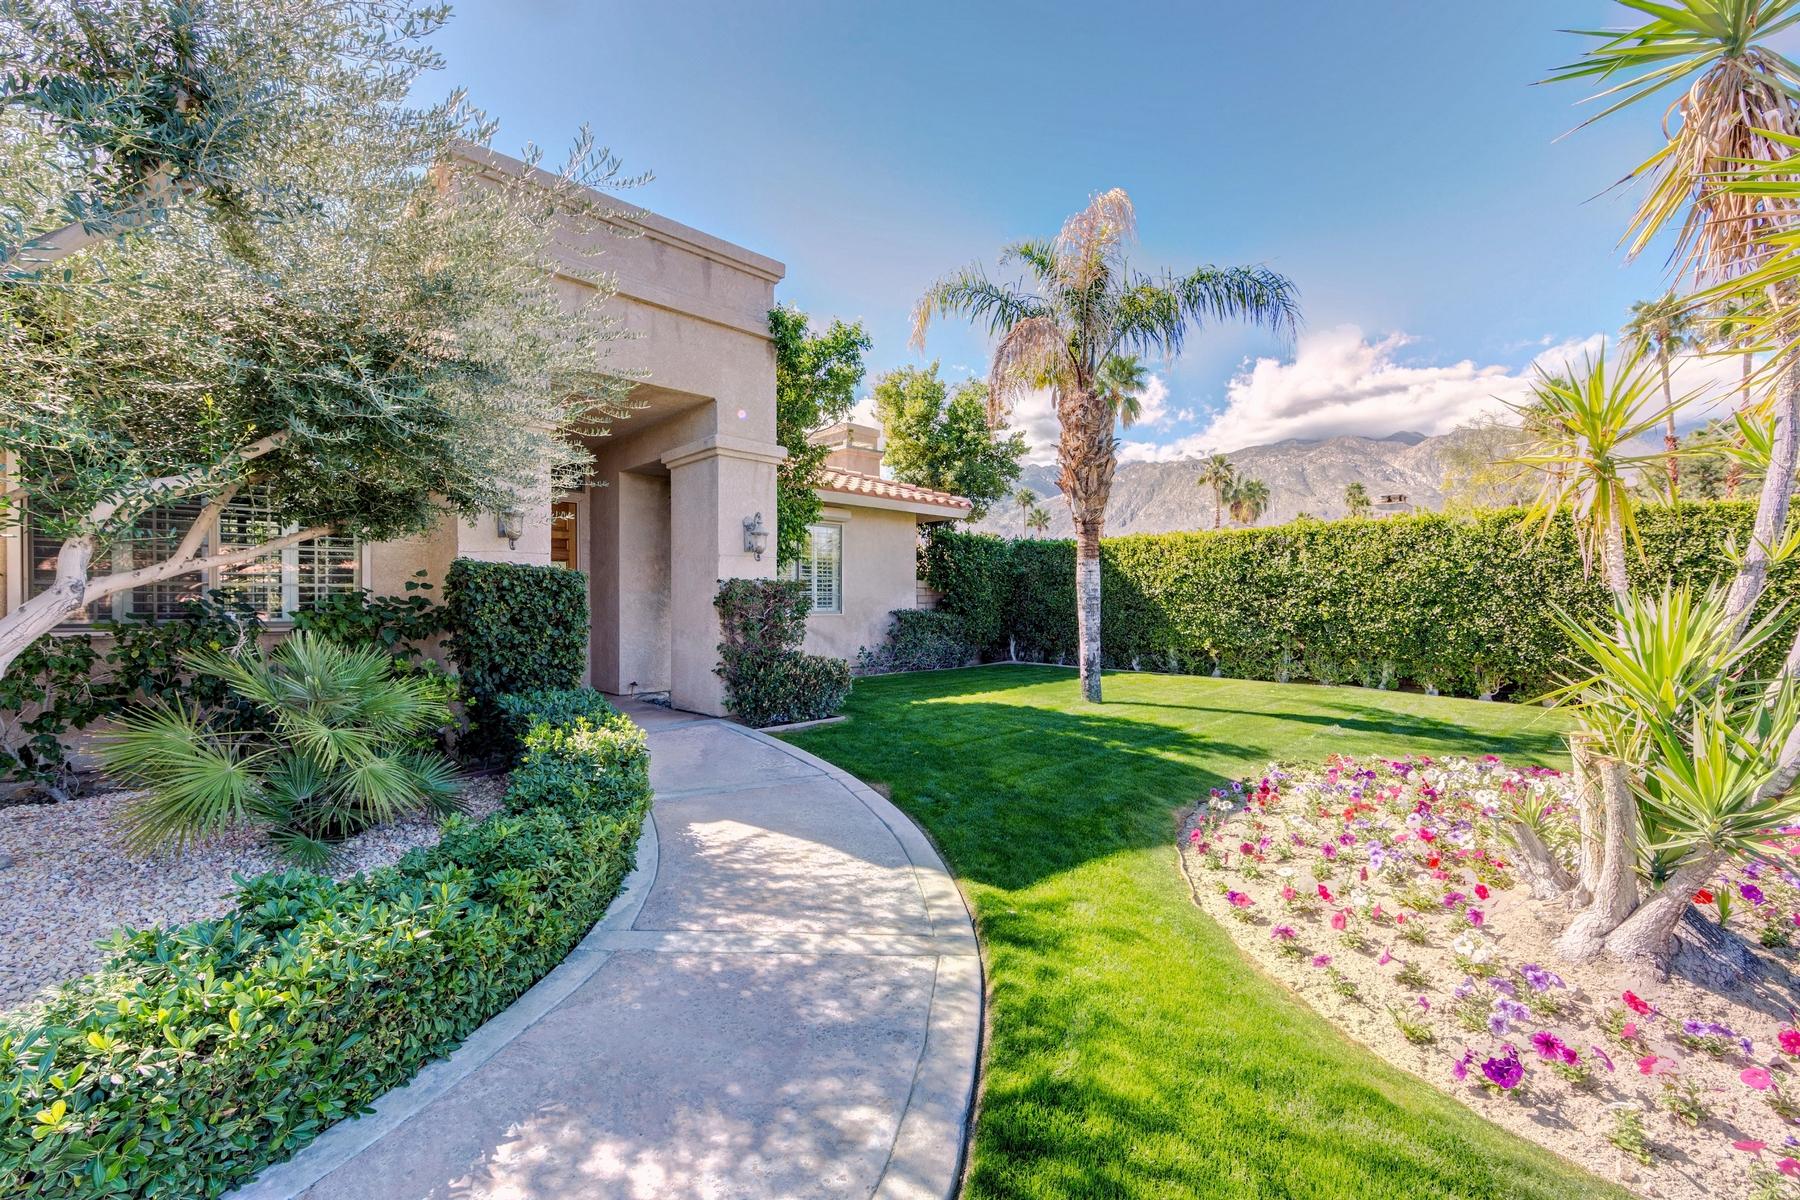 Villa per Vendita alle ore 2351 Tamarisk Road 2351Tamarisk Road North Palm Springs, California, 92262 Stati Uniti